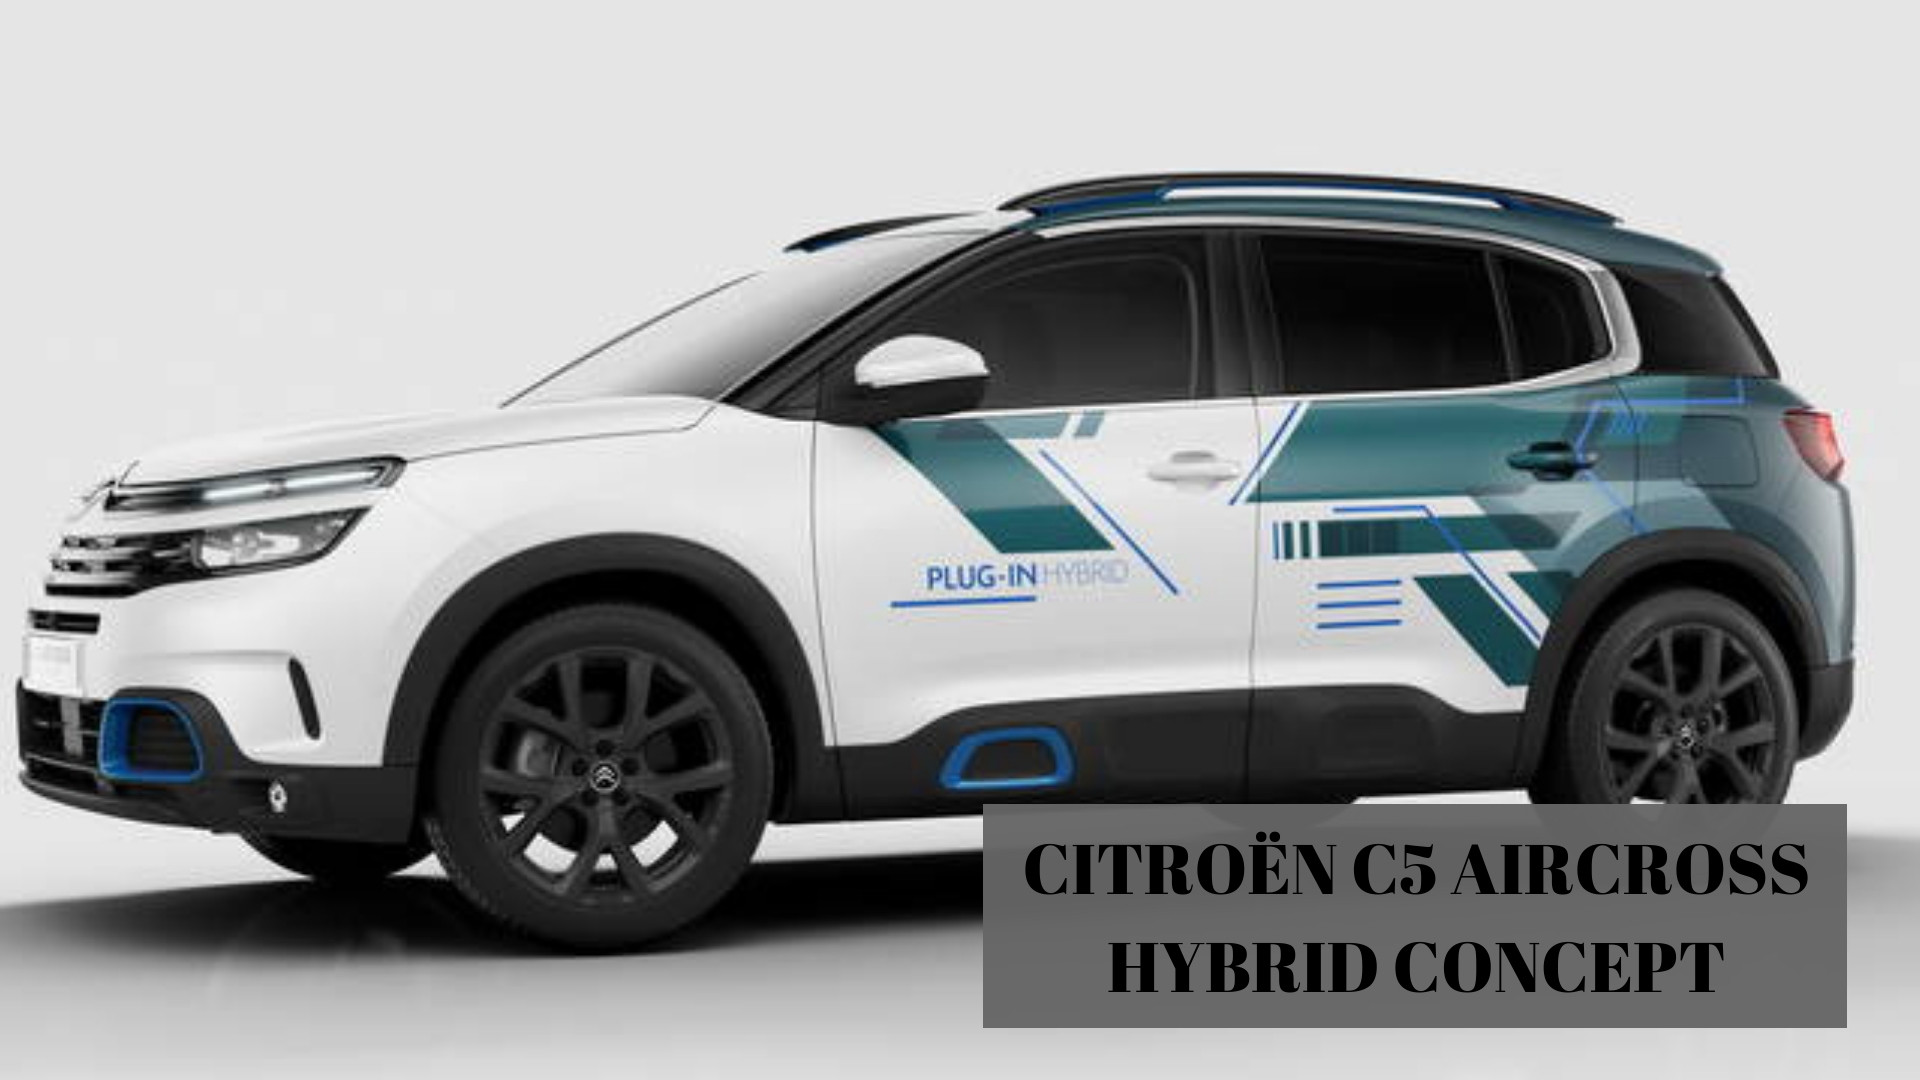 C5 Aircross Hybrid Concept, primo PHEV targato Citroën